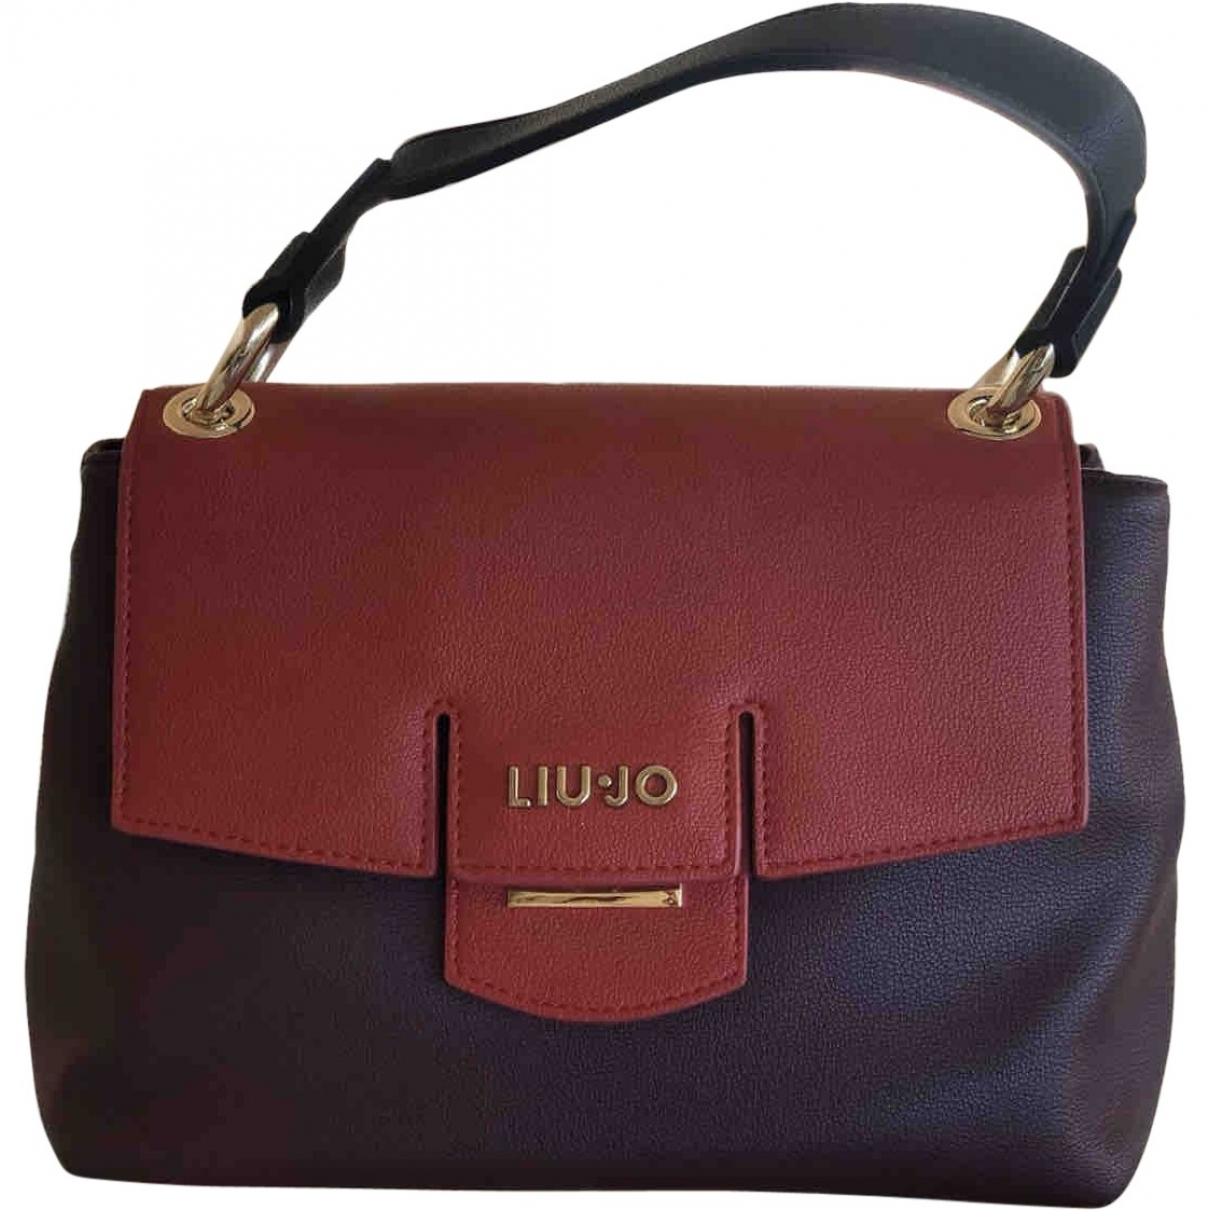 Liu.jo \N Handtasche in Leder